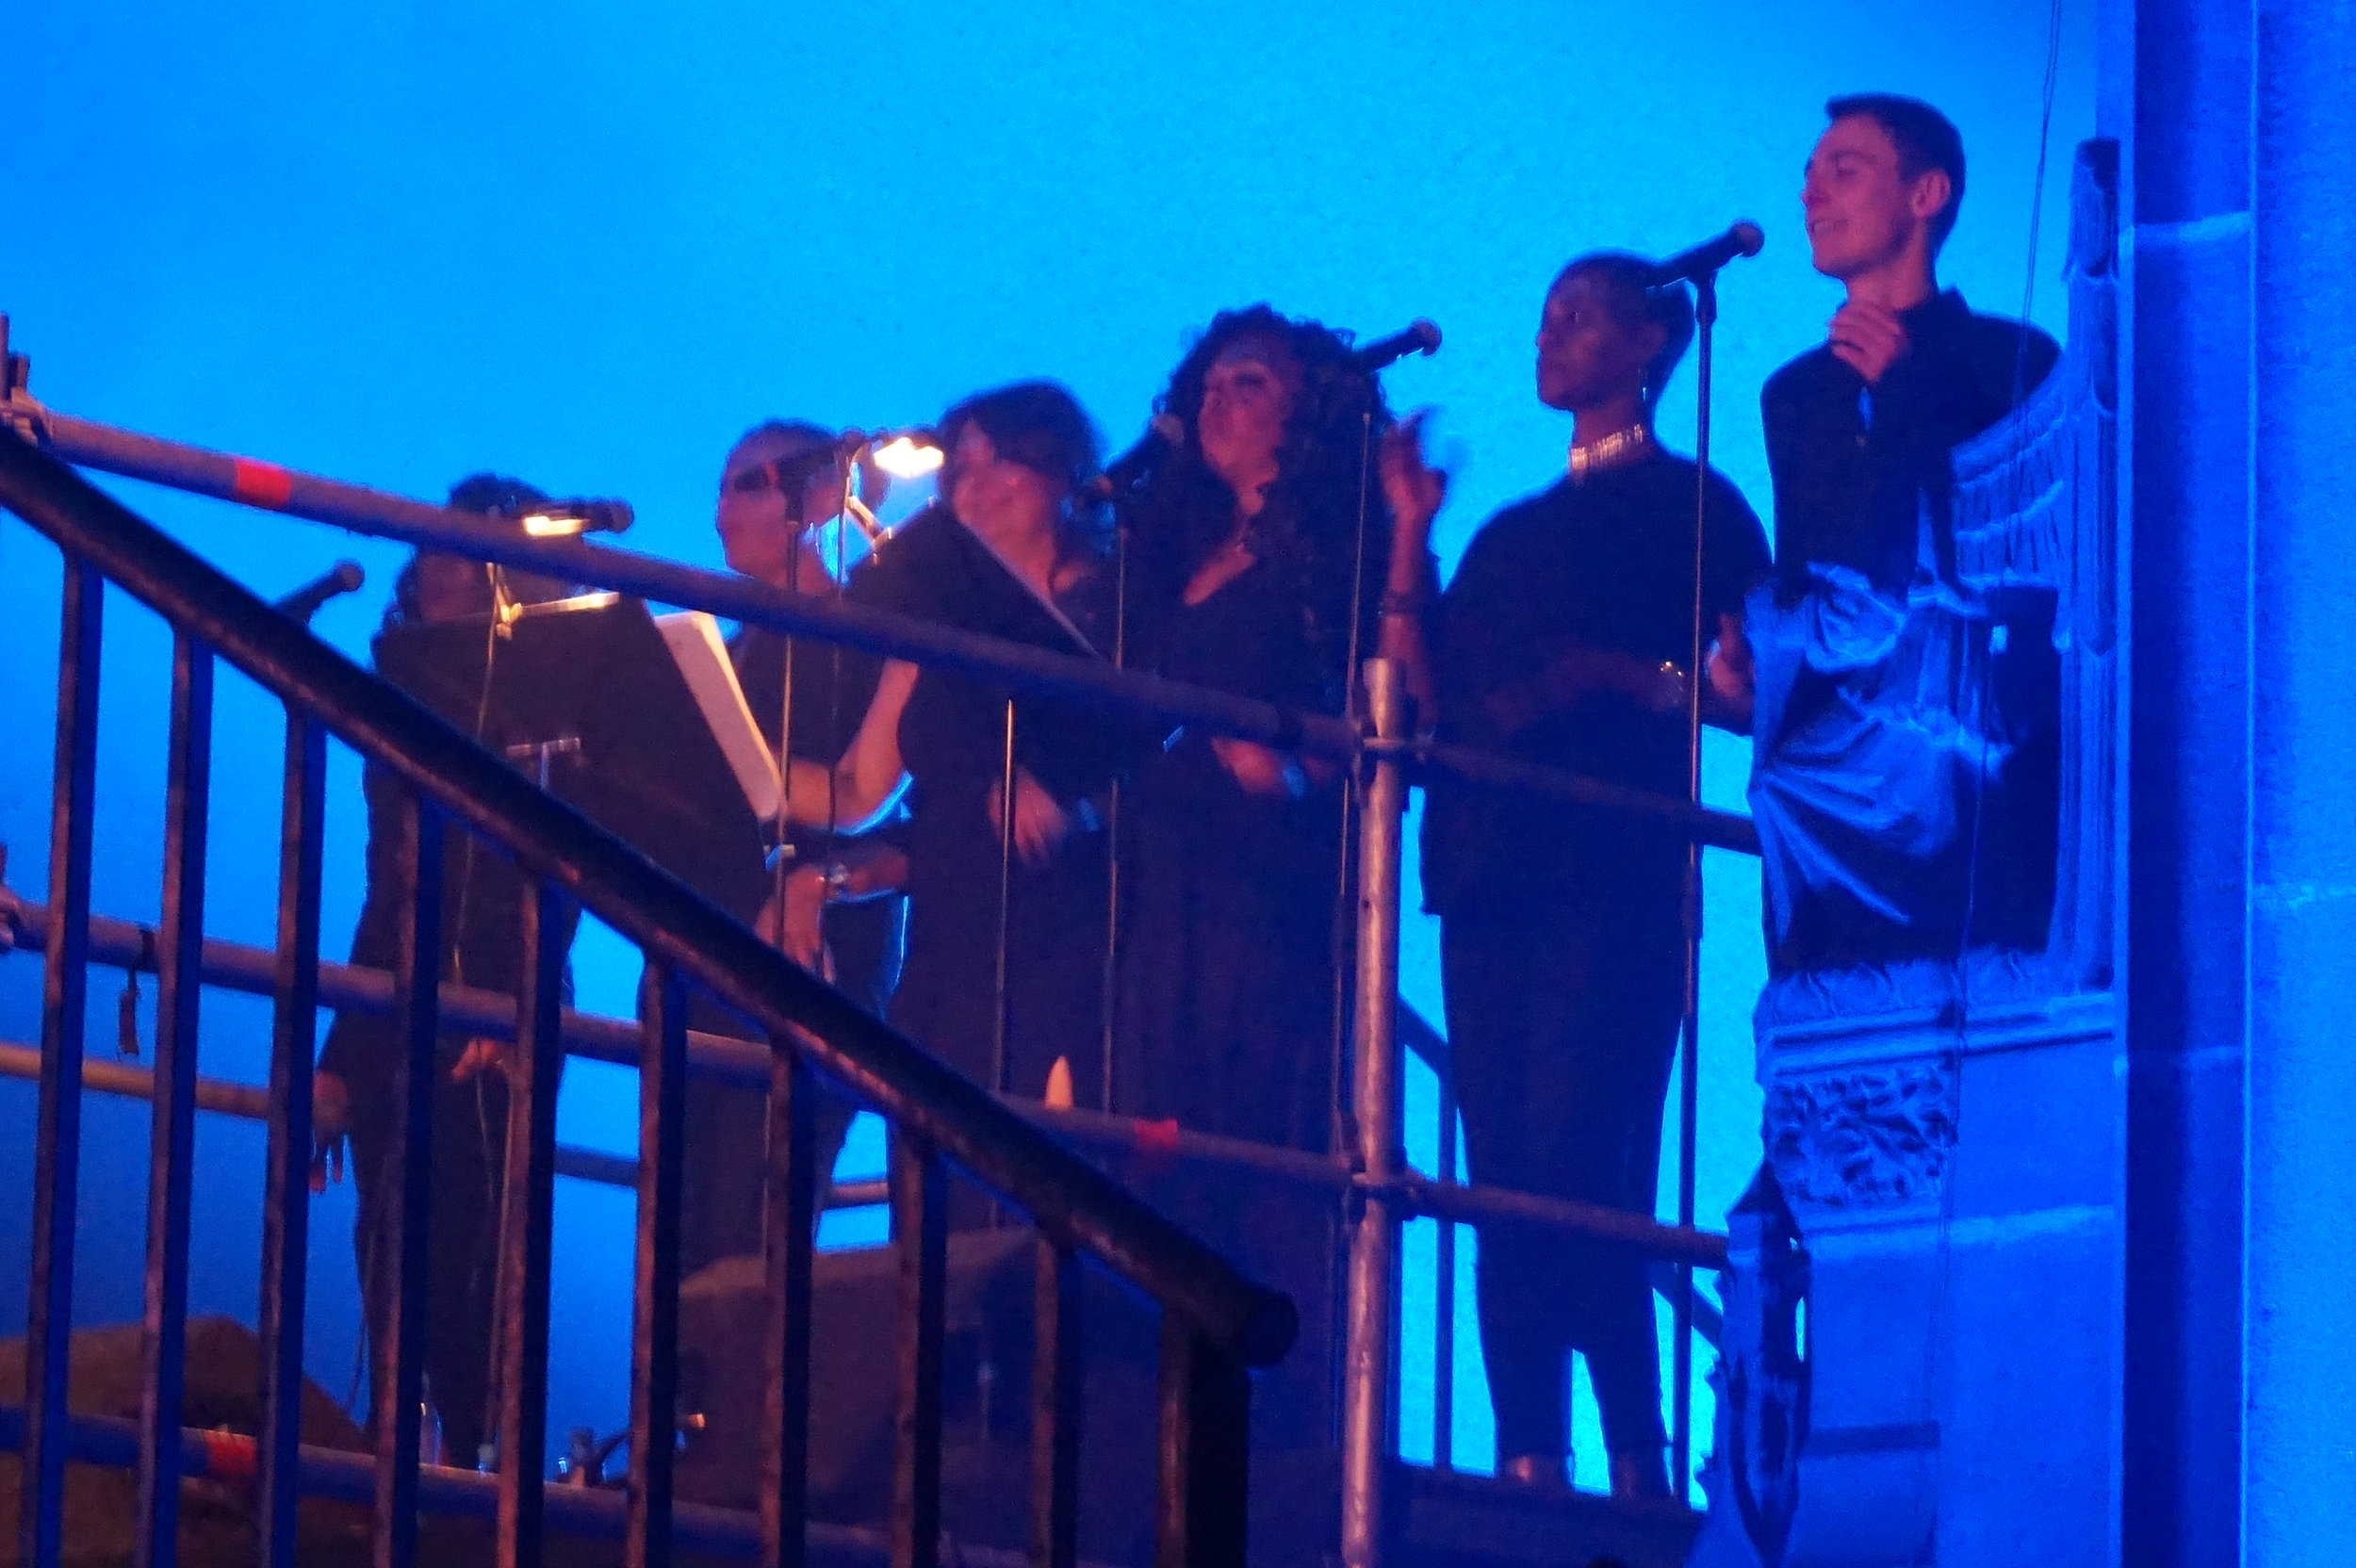 Singers on stage cream.JPG